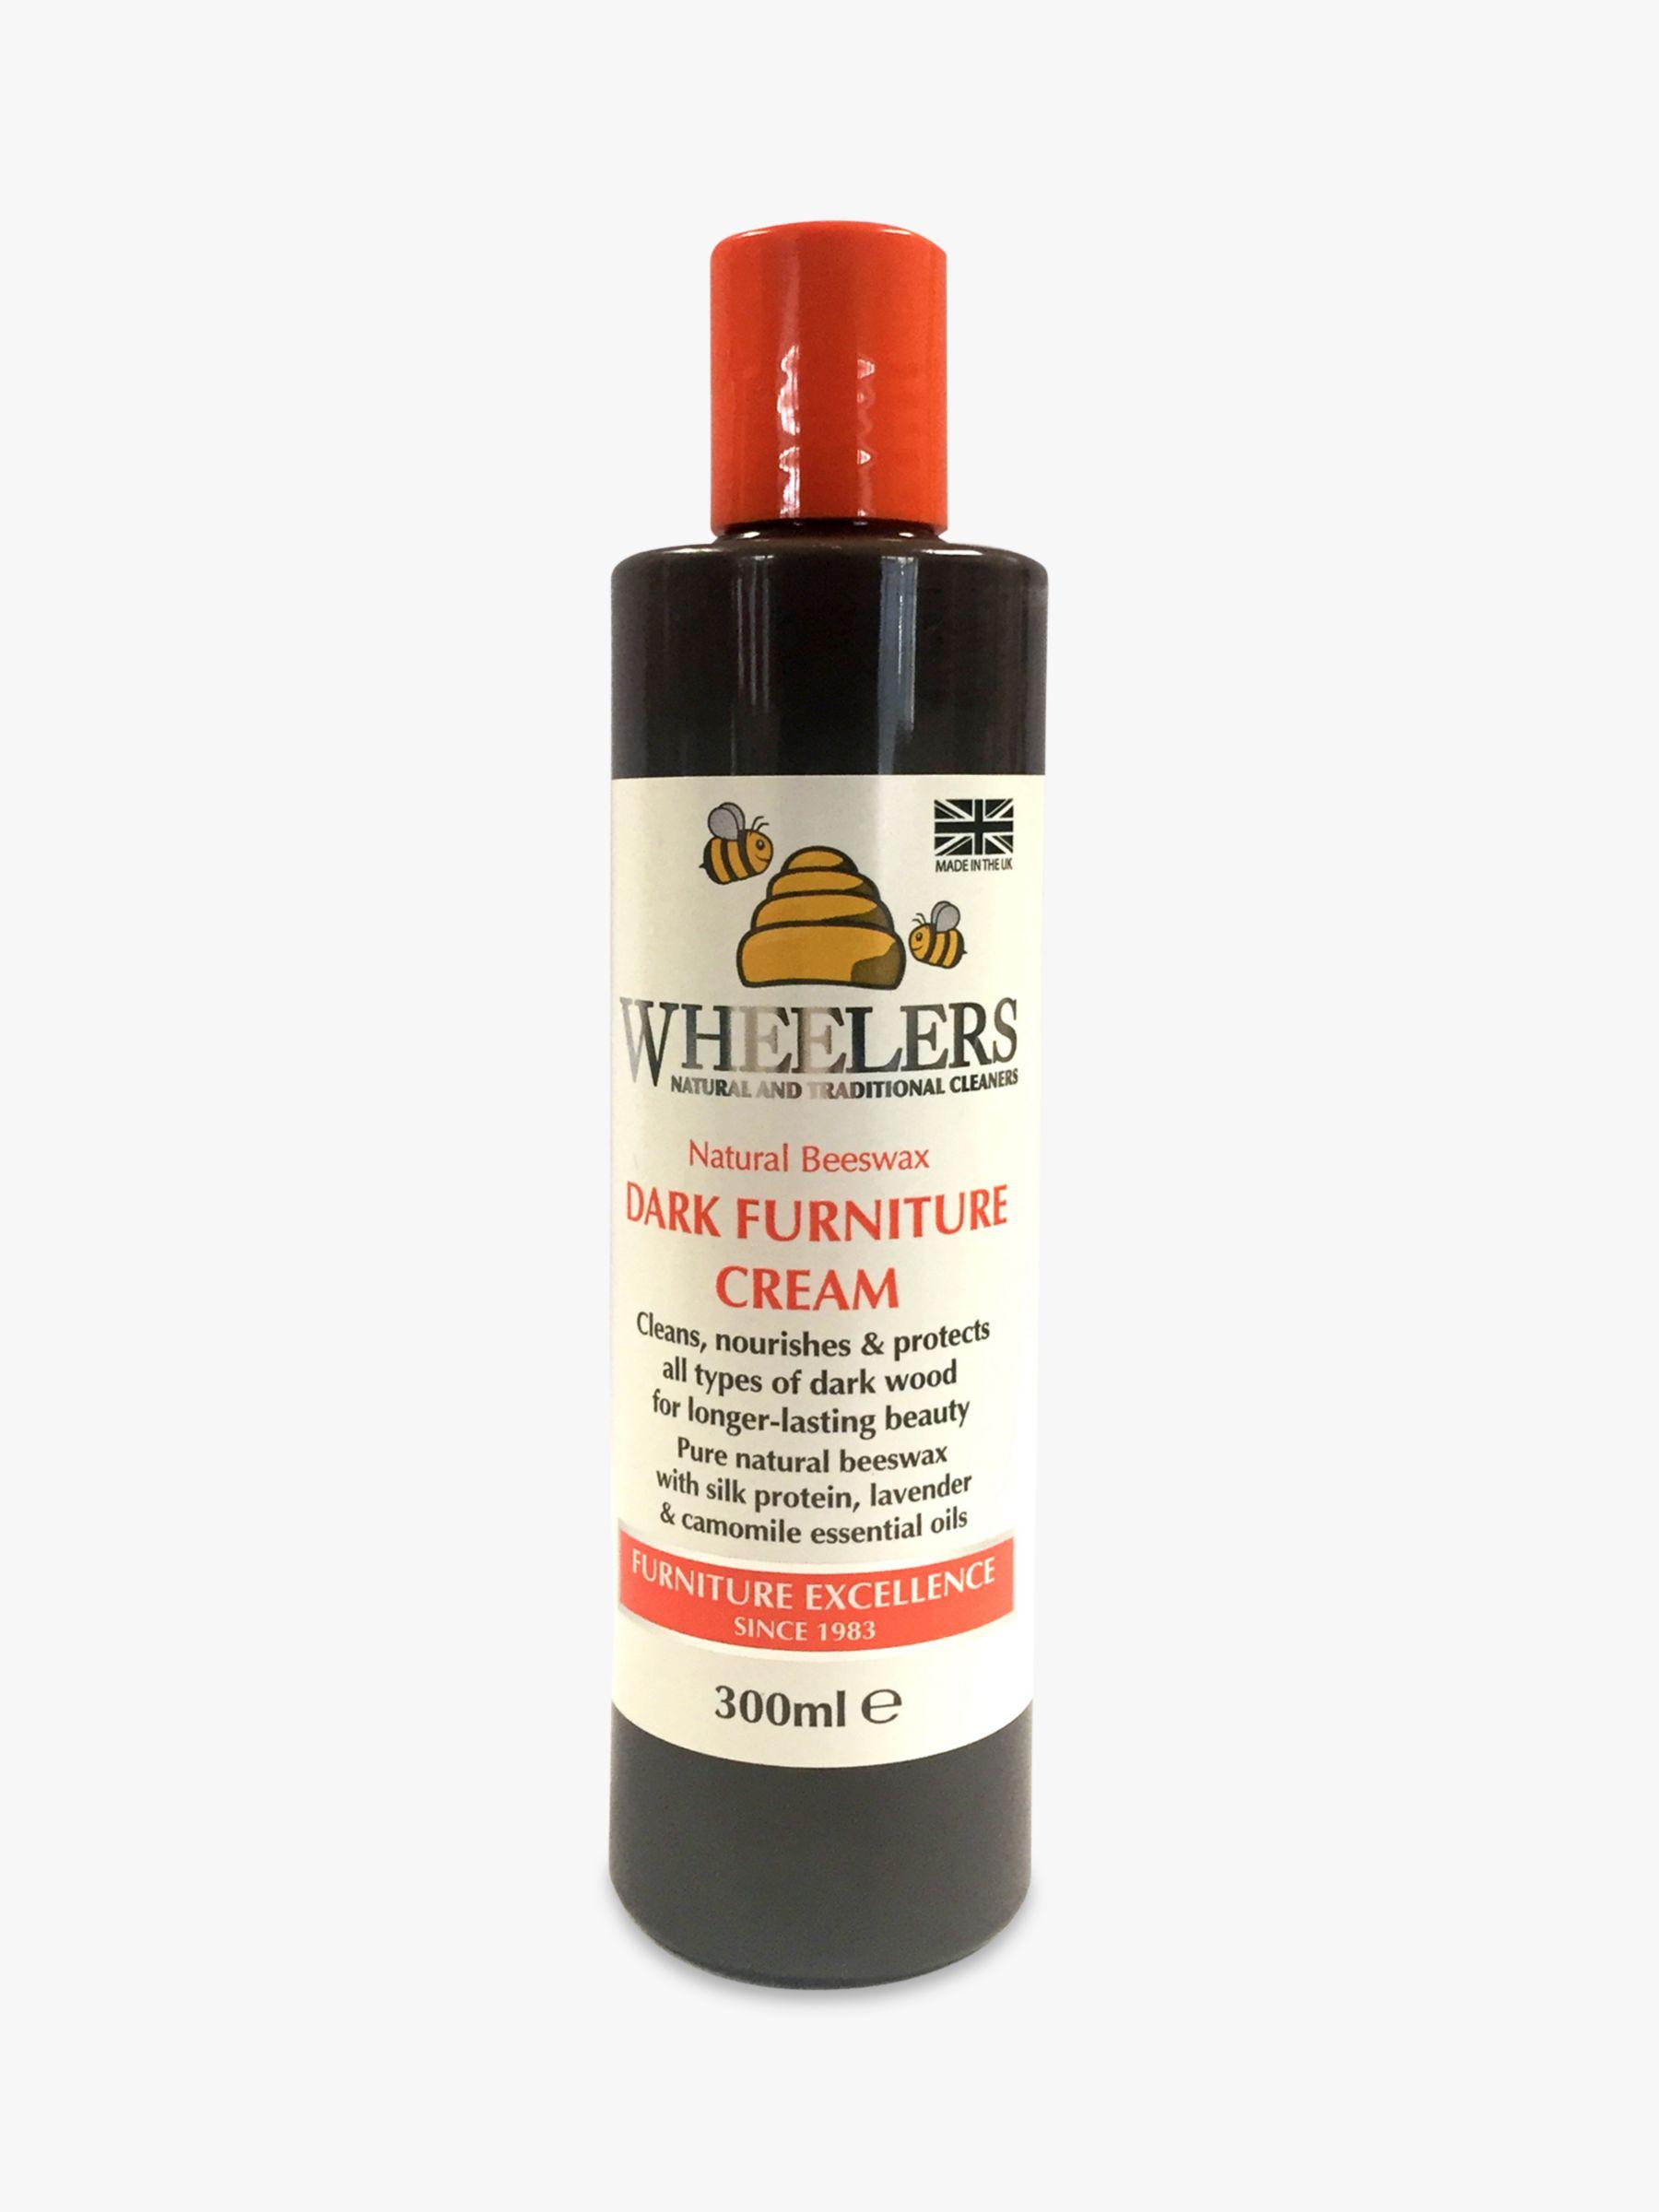 Wheelers Wheelers Natural Beeswax Dark Furniture Cream, 300ml